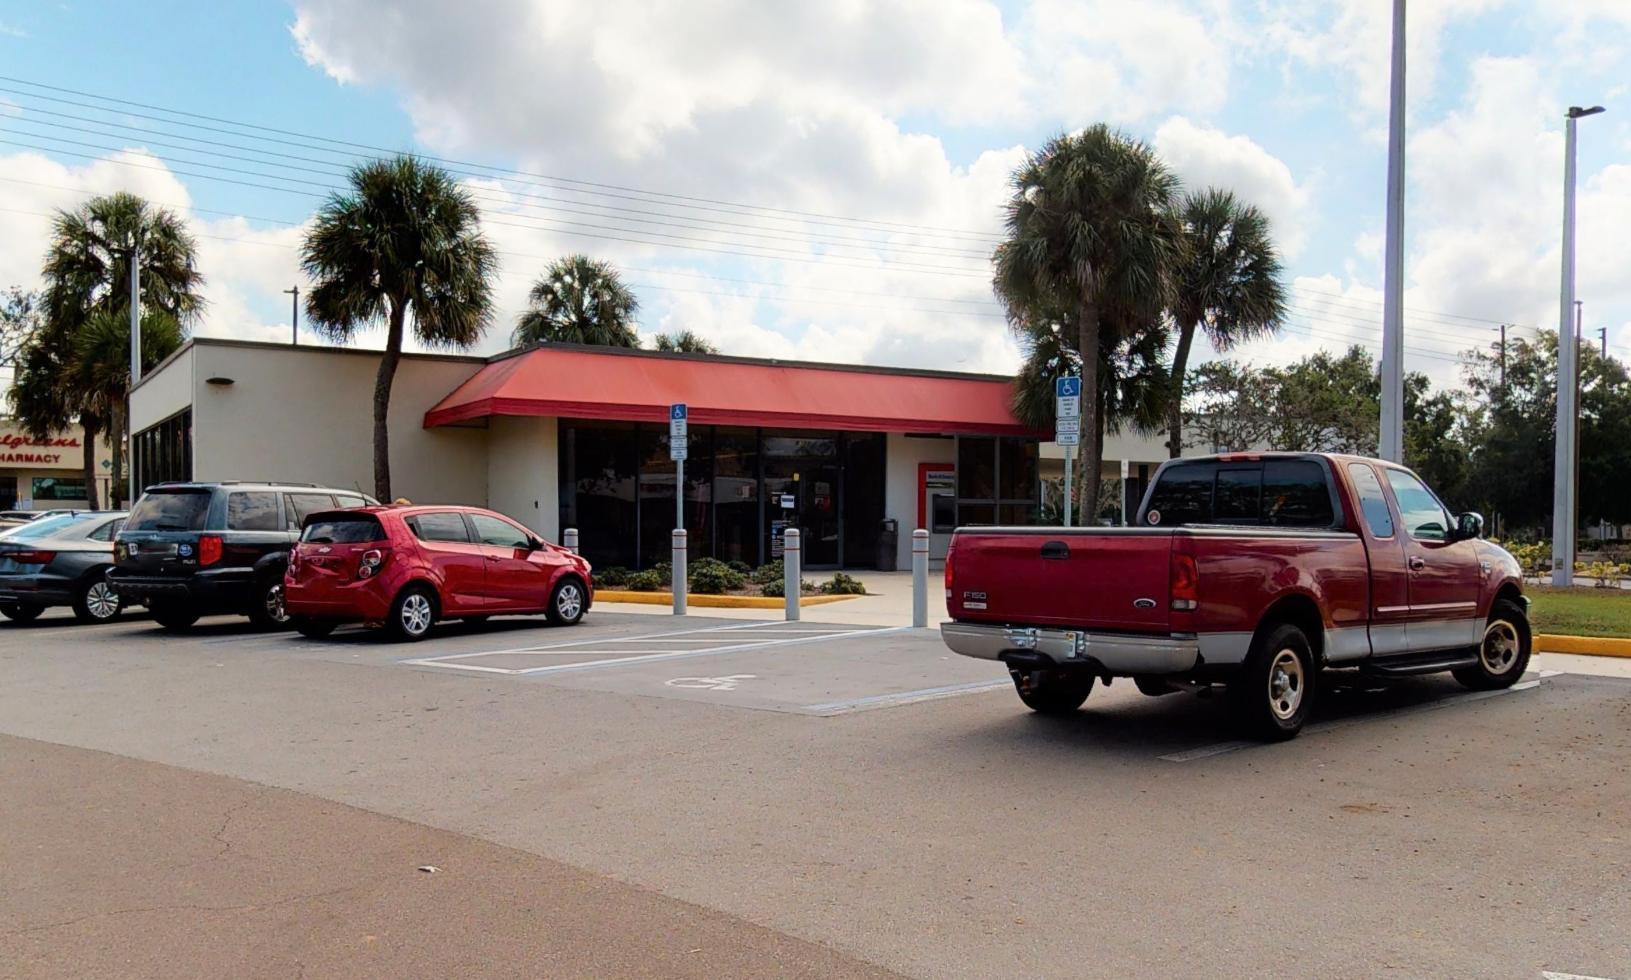 Bank of America financial center with drive-thru ATM | 8338 Embassy Blvd, Port Richey, FL 34668